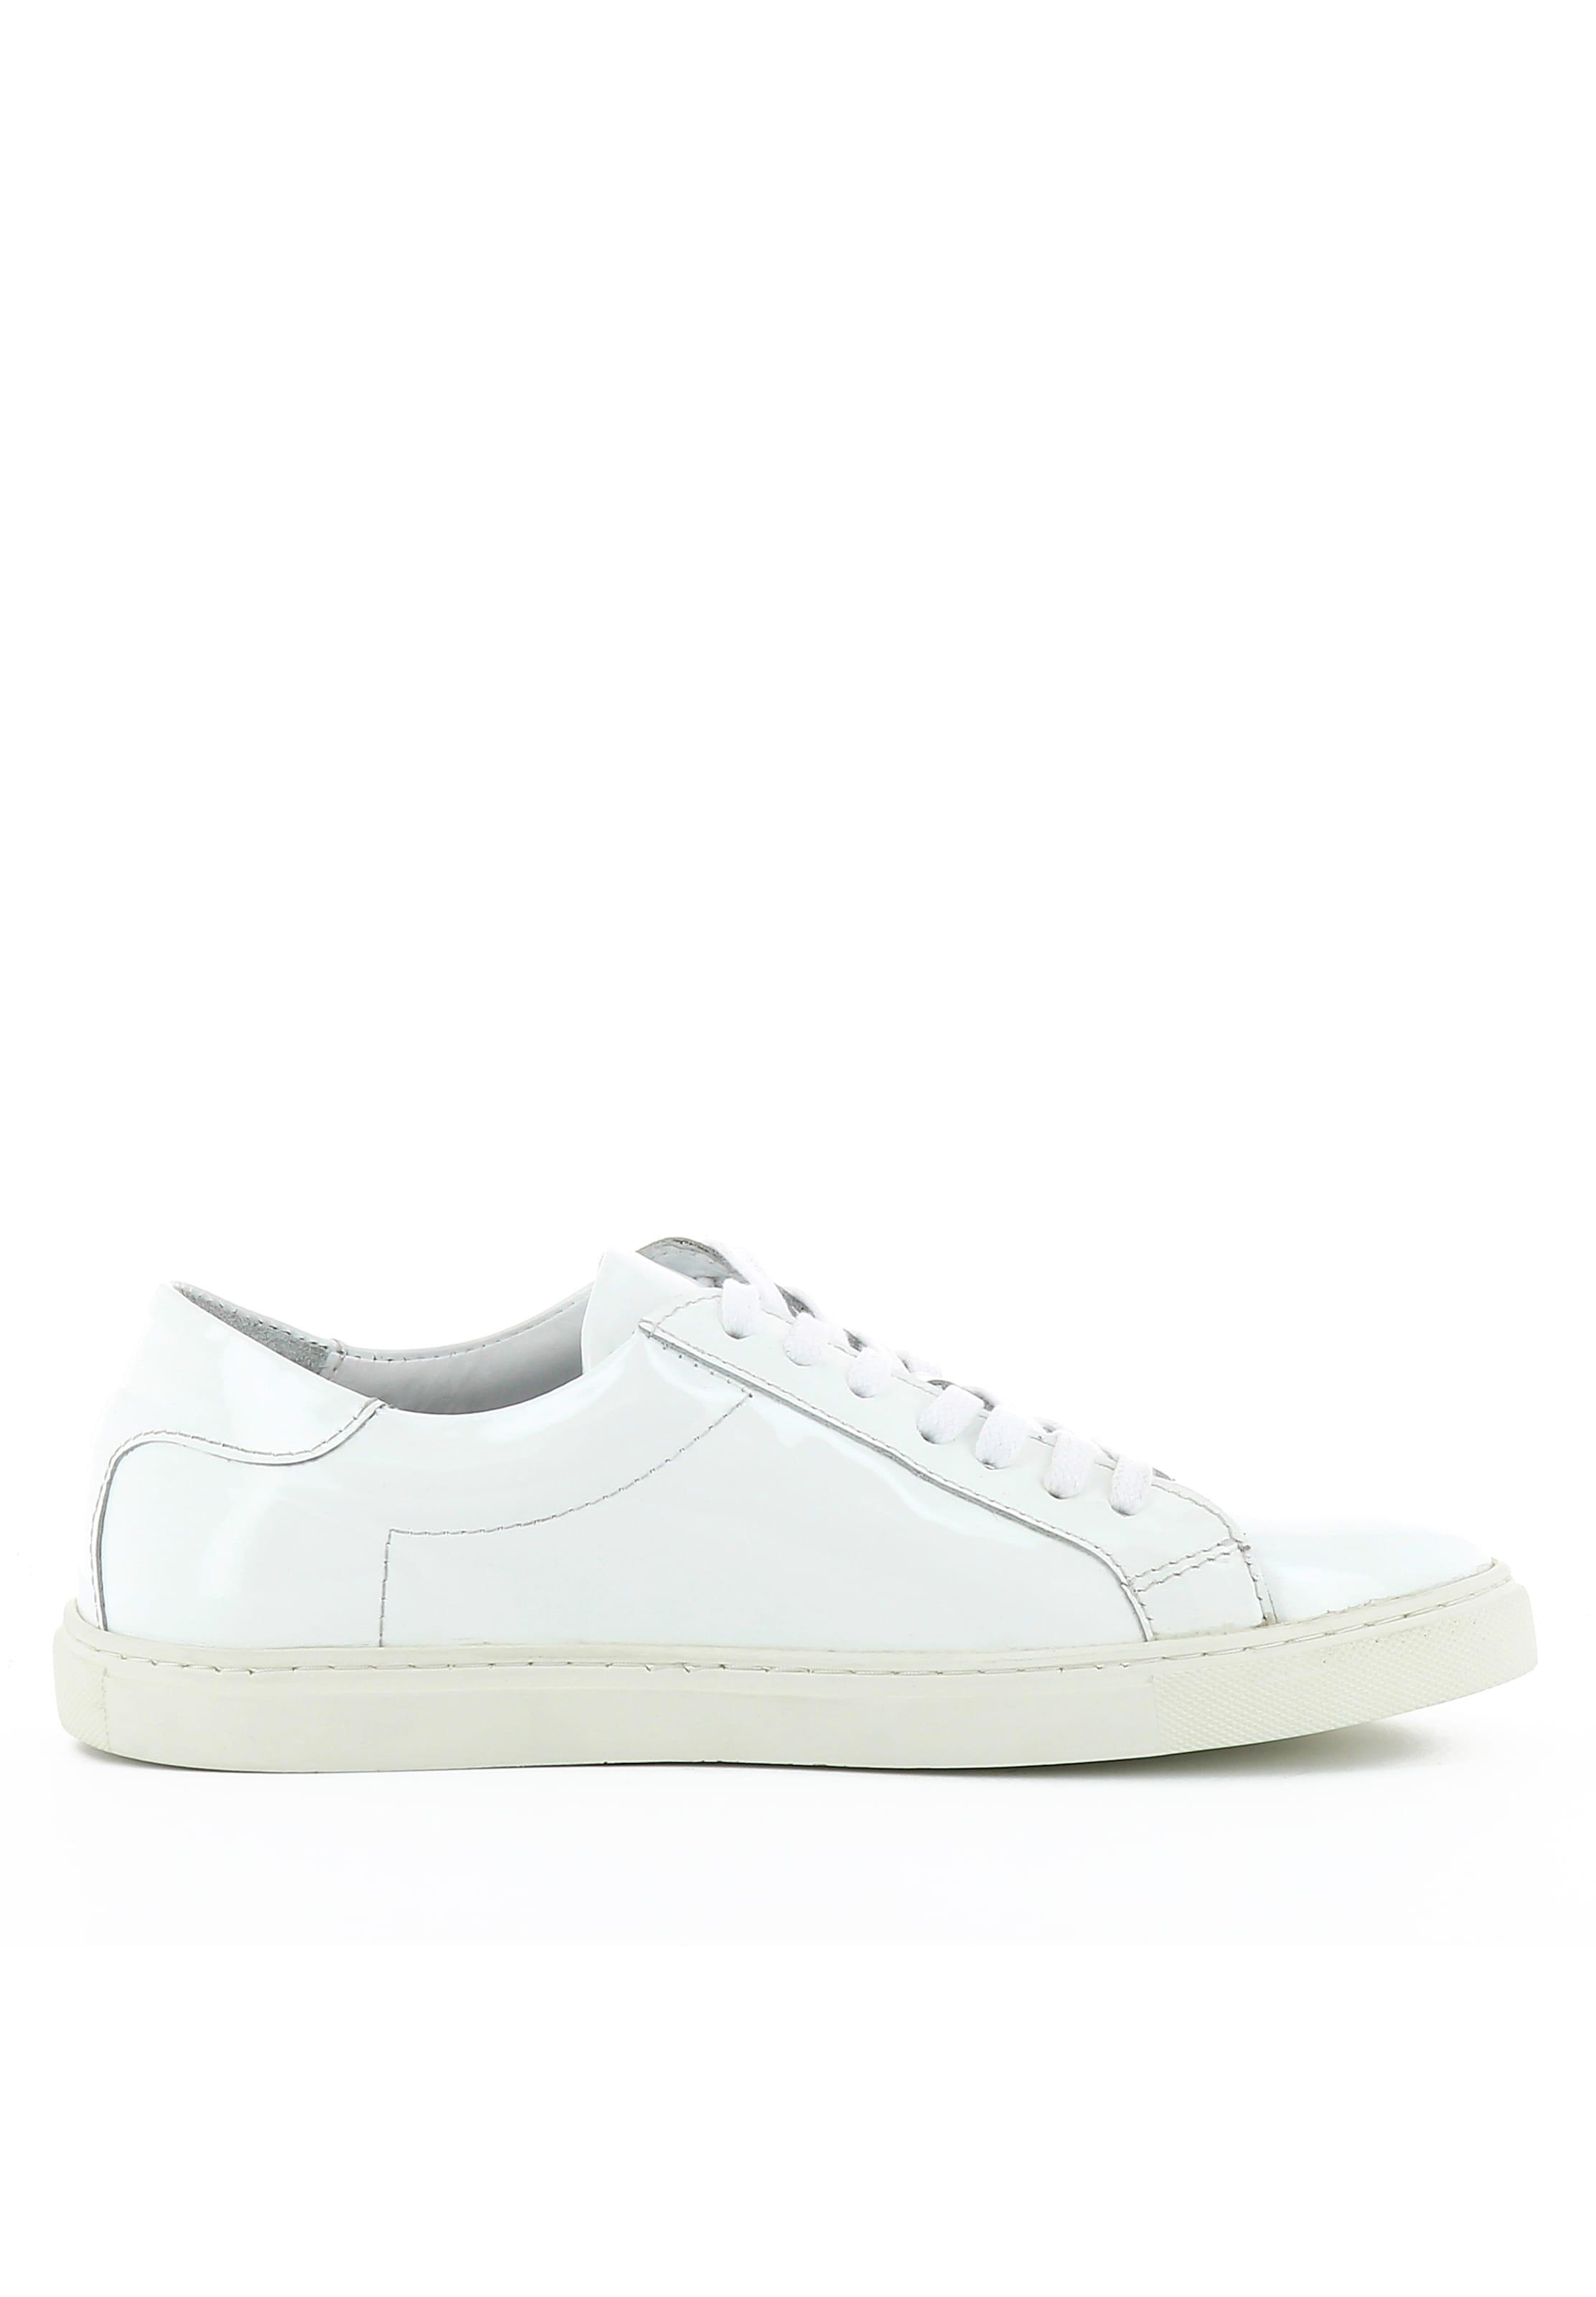 Sneaker In Evita Damen Marisa Weiß trdCQosxhB